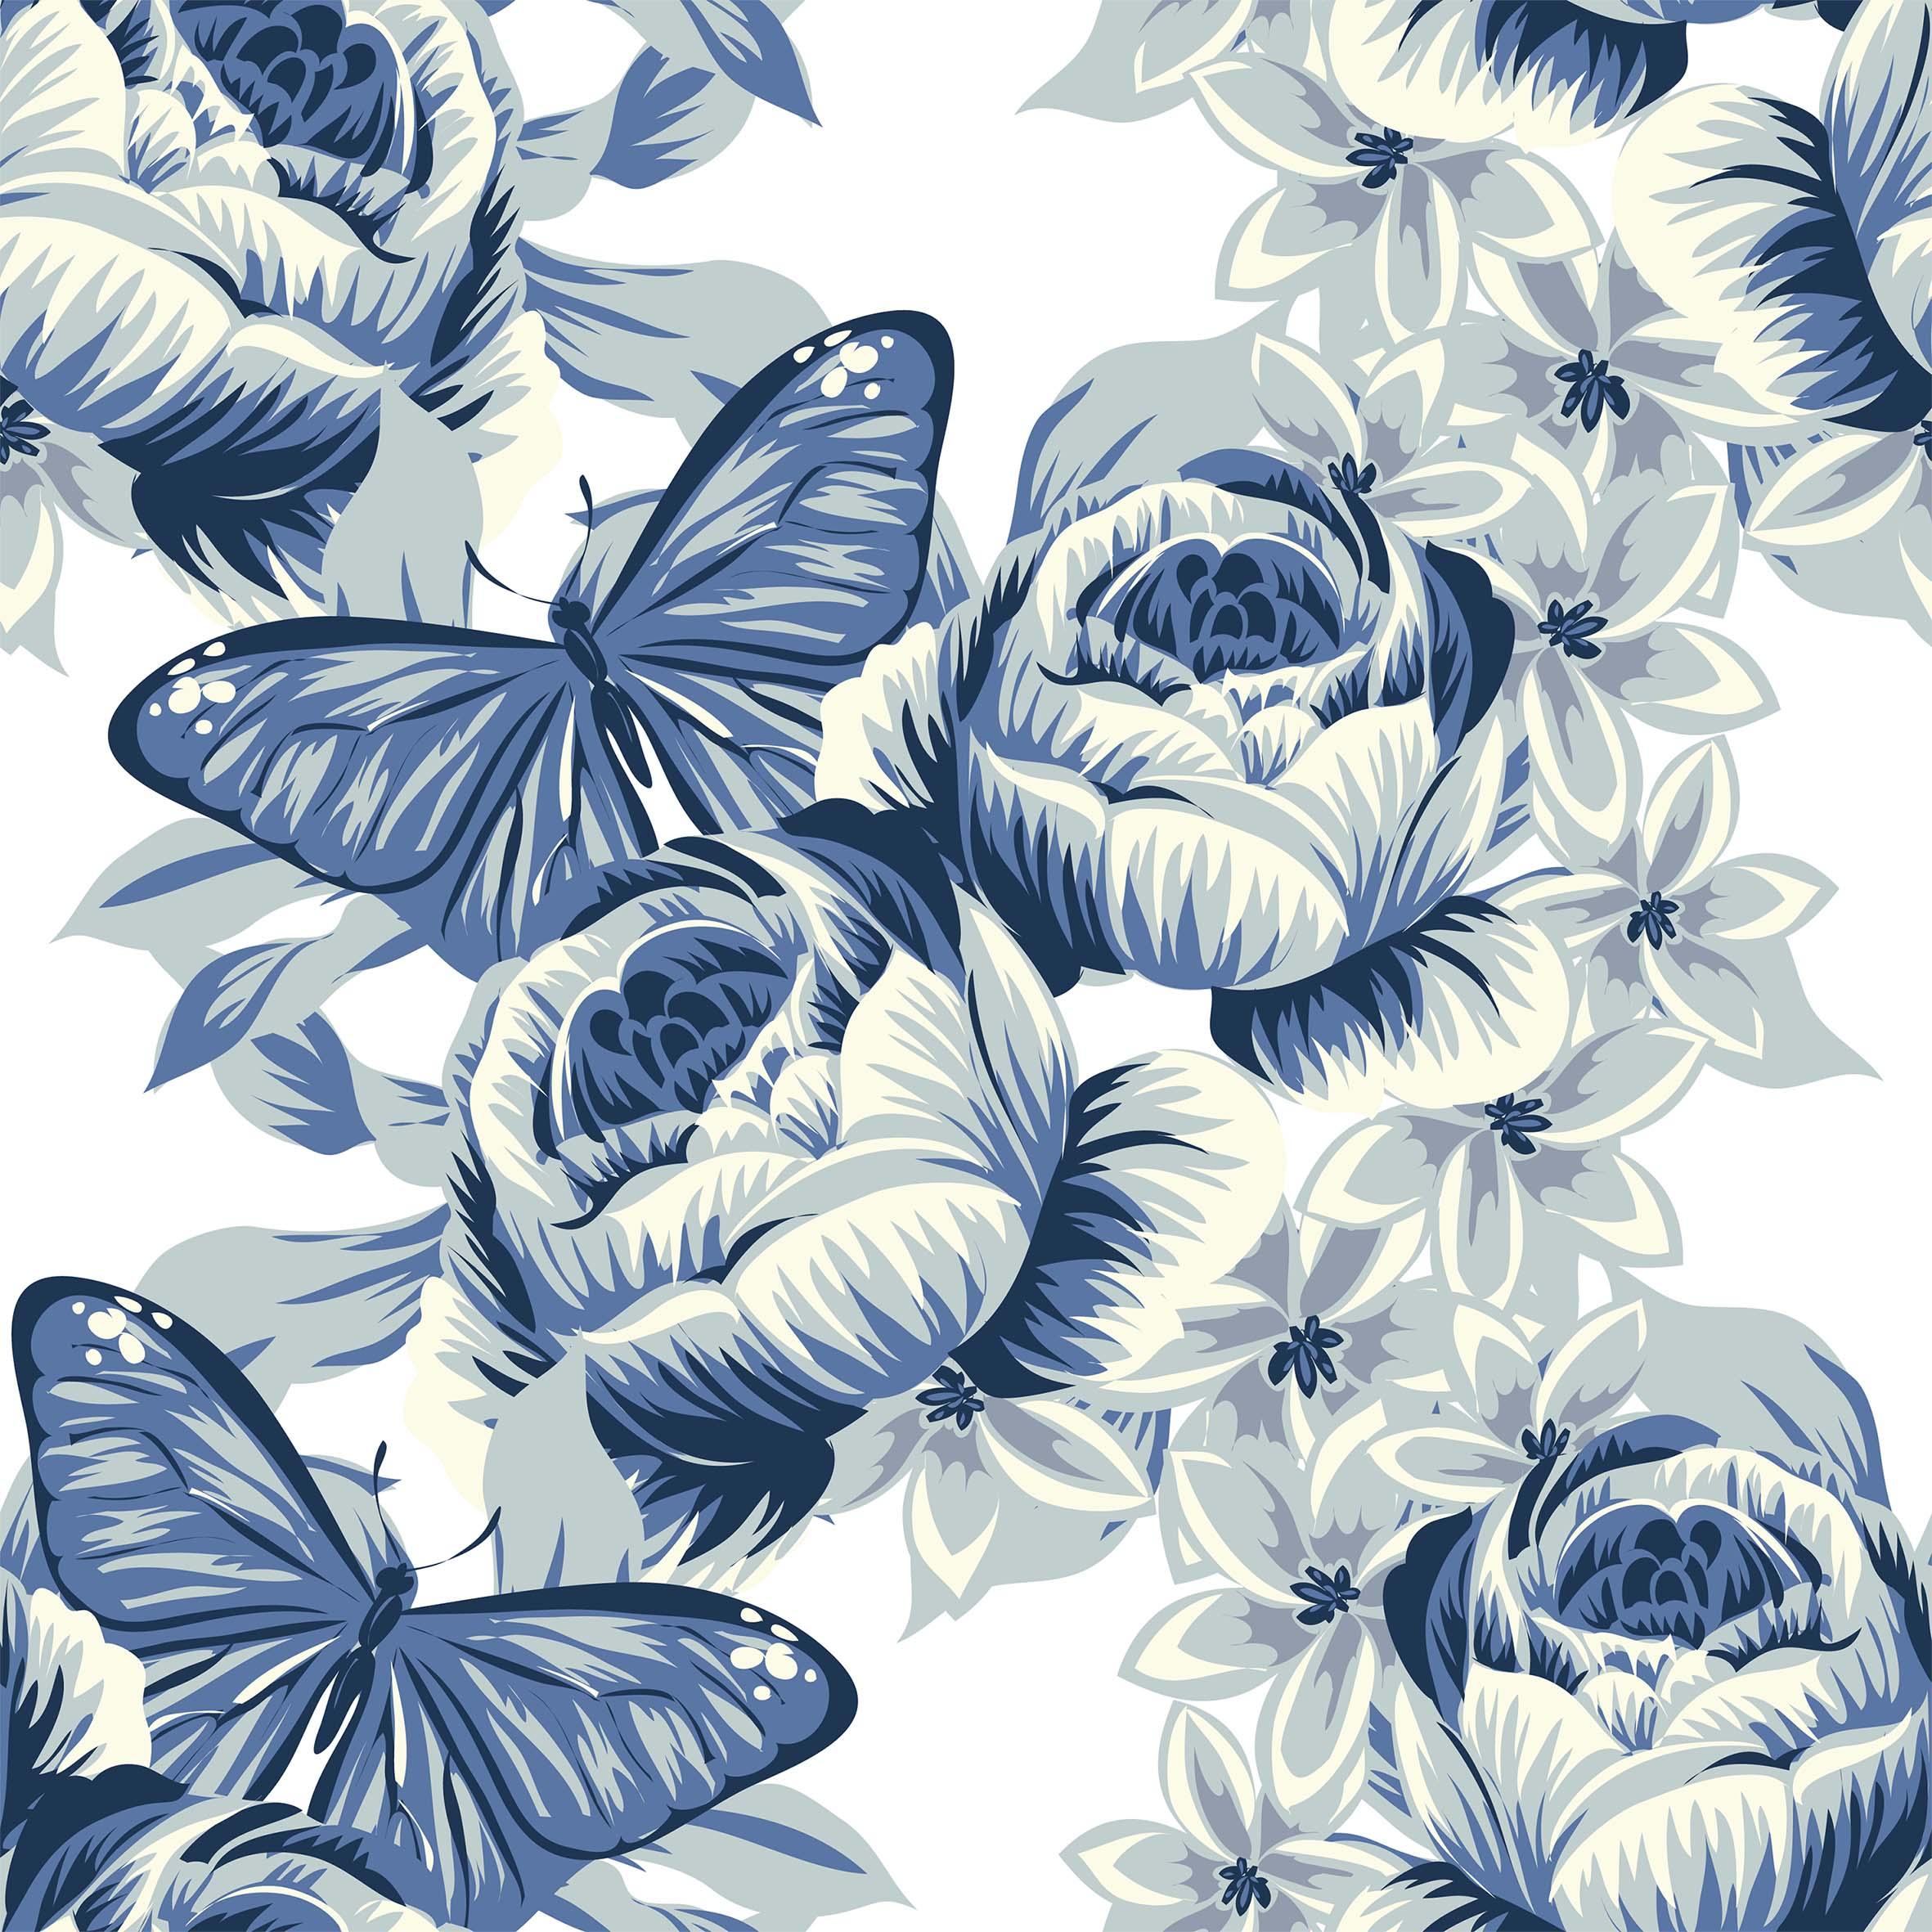 Baumwolljersey - Blue Butterflies - Schnuckidu Eigenproduktion - Vorbestellung